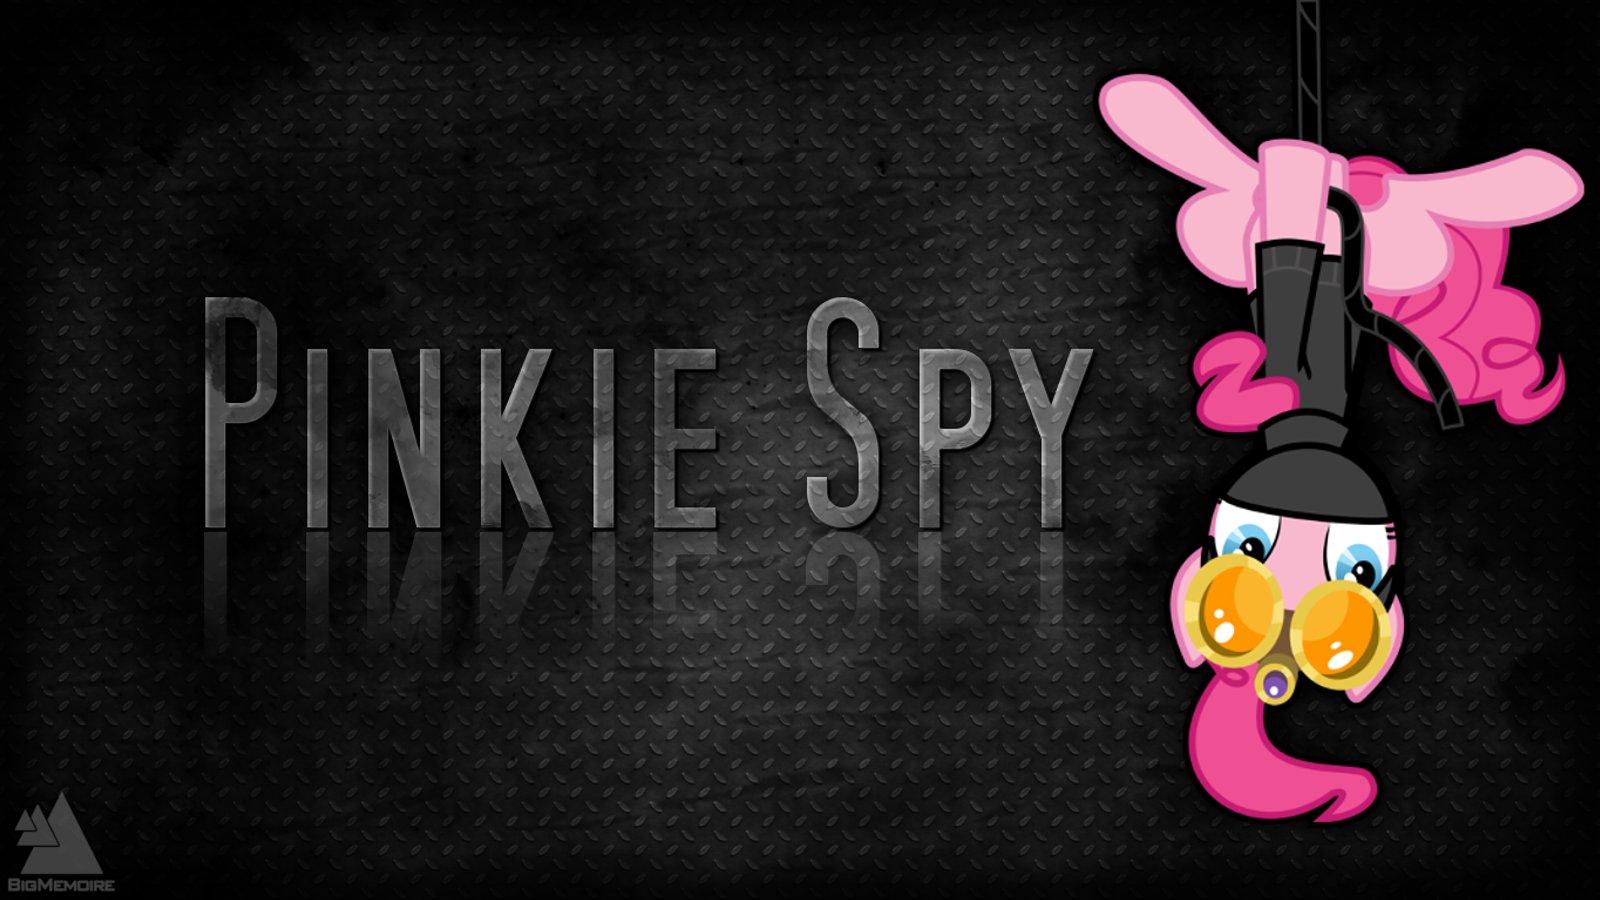 Pinkie Spy Wallpaper 1 by BigMemoire